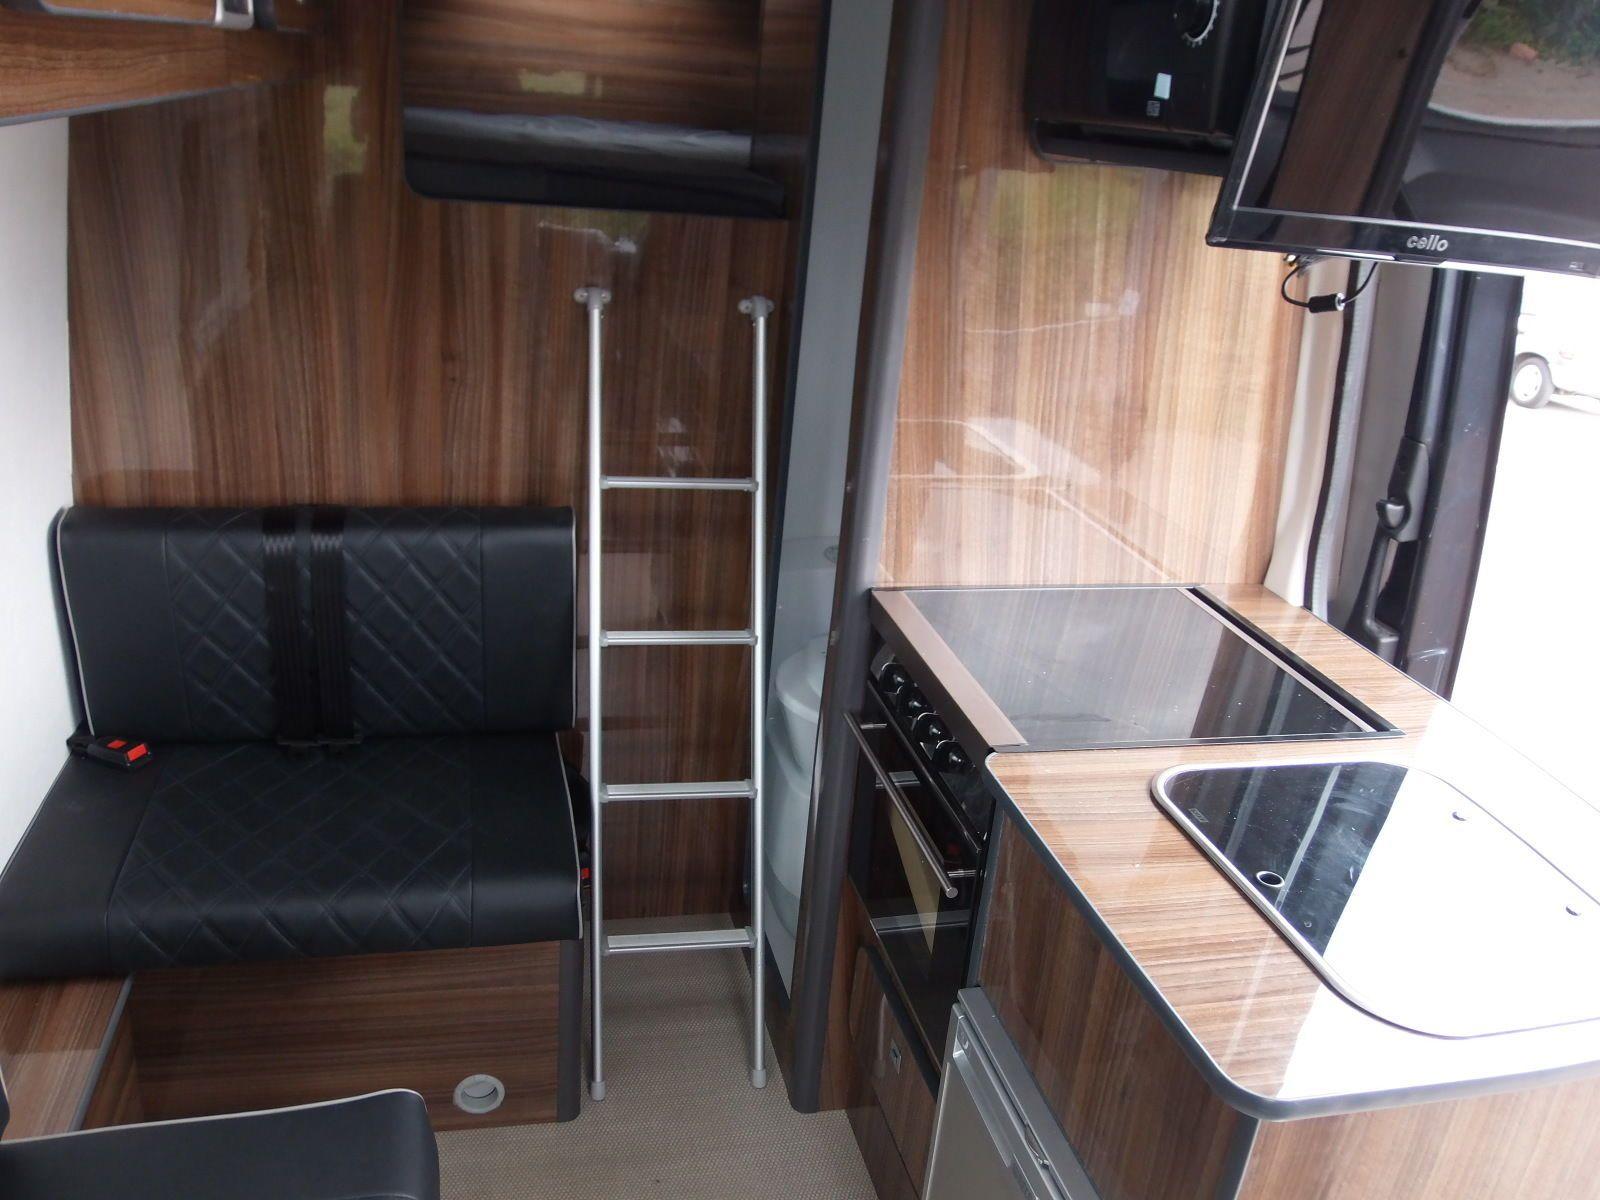 Race Van Conversion Interior Kit For Sprinter Crafter Vans Van Life And Motorhome